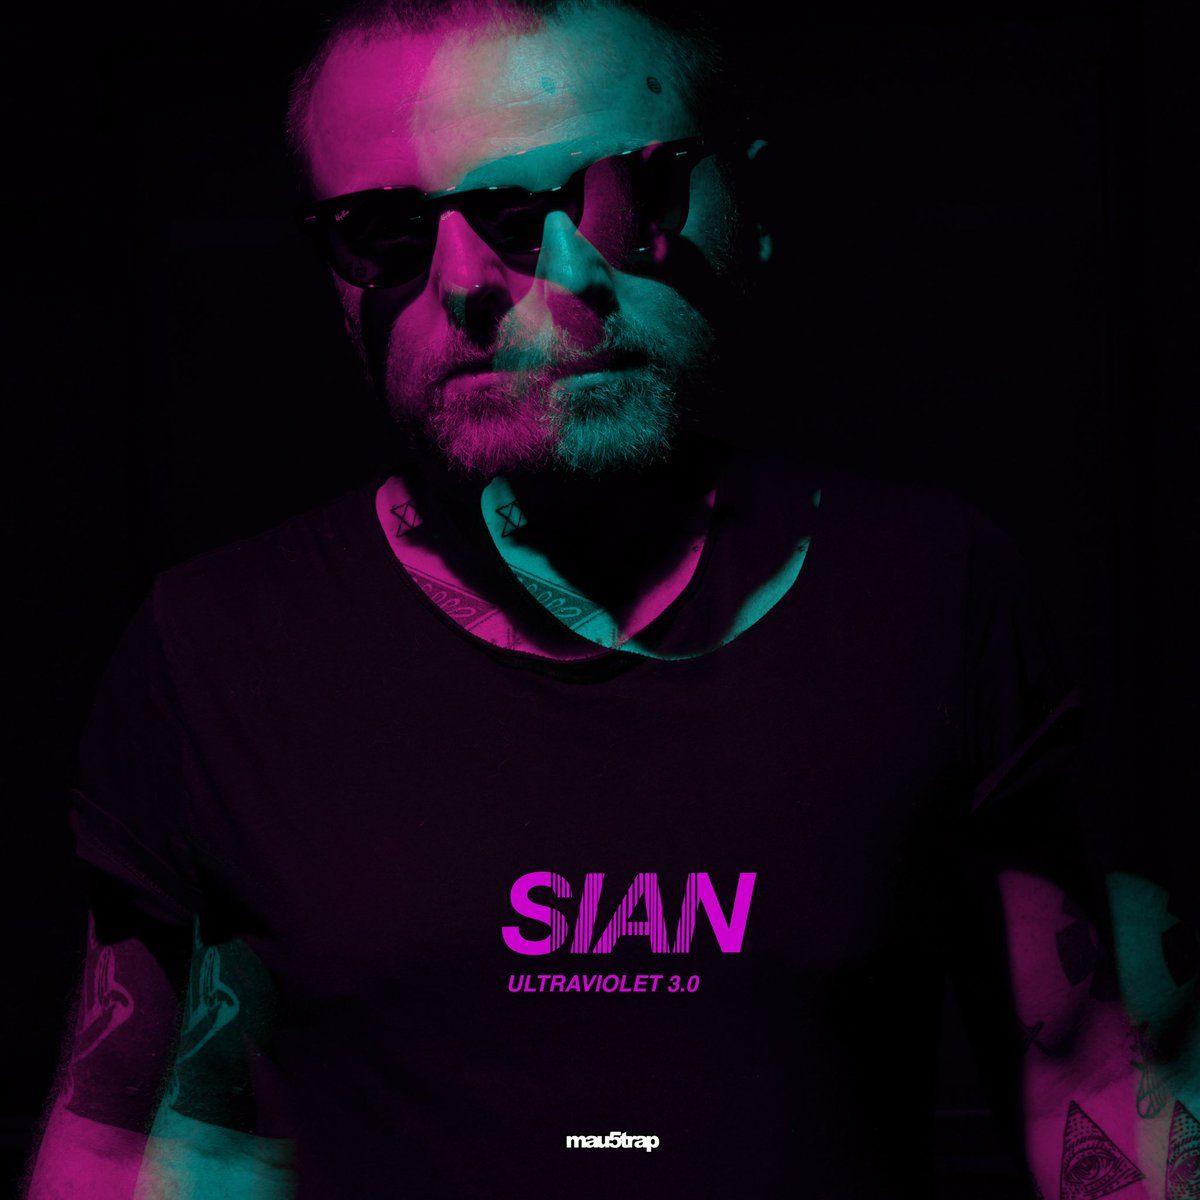 Sian – Ultraviolet 3.0